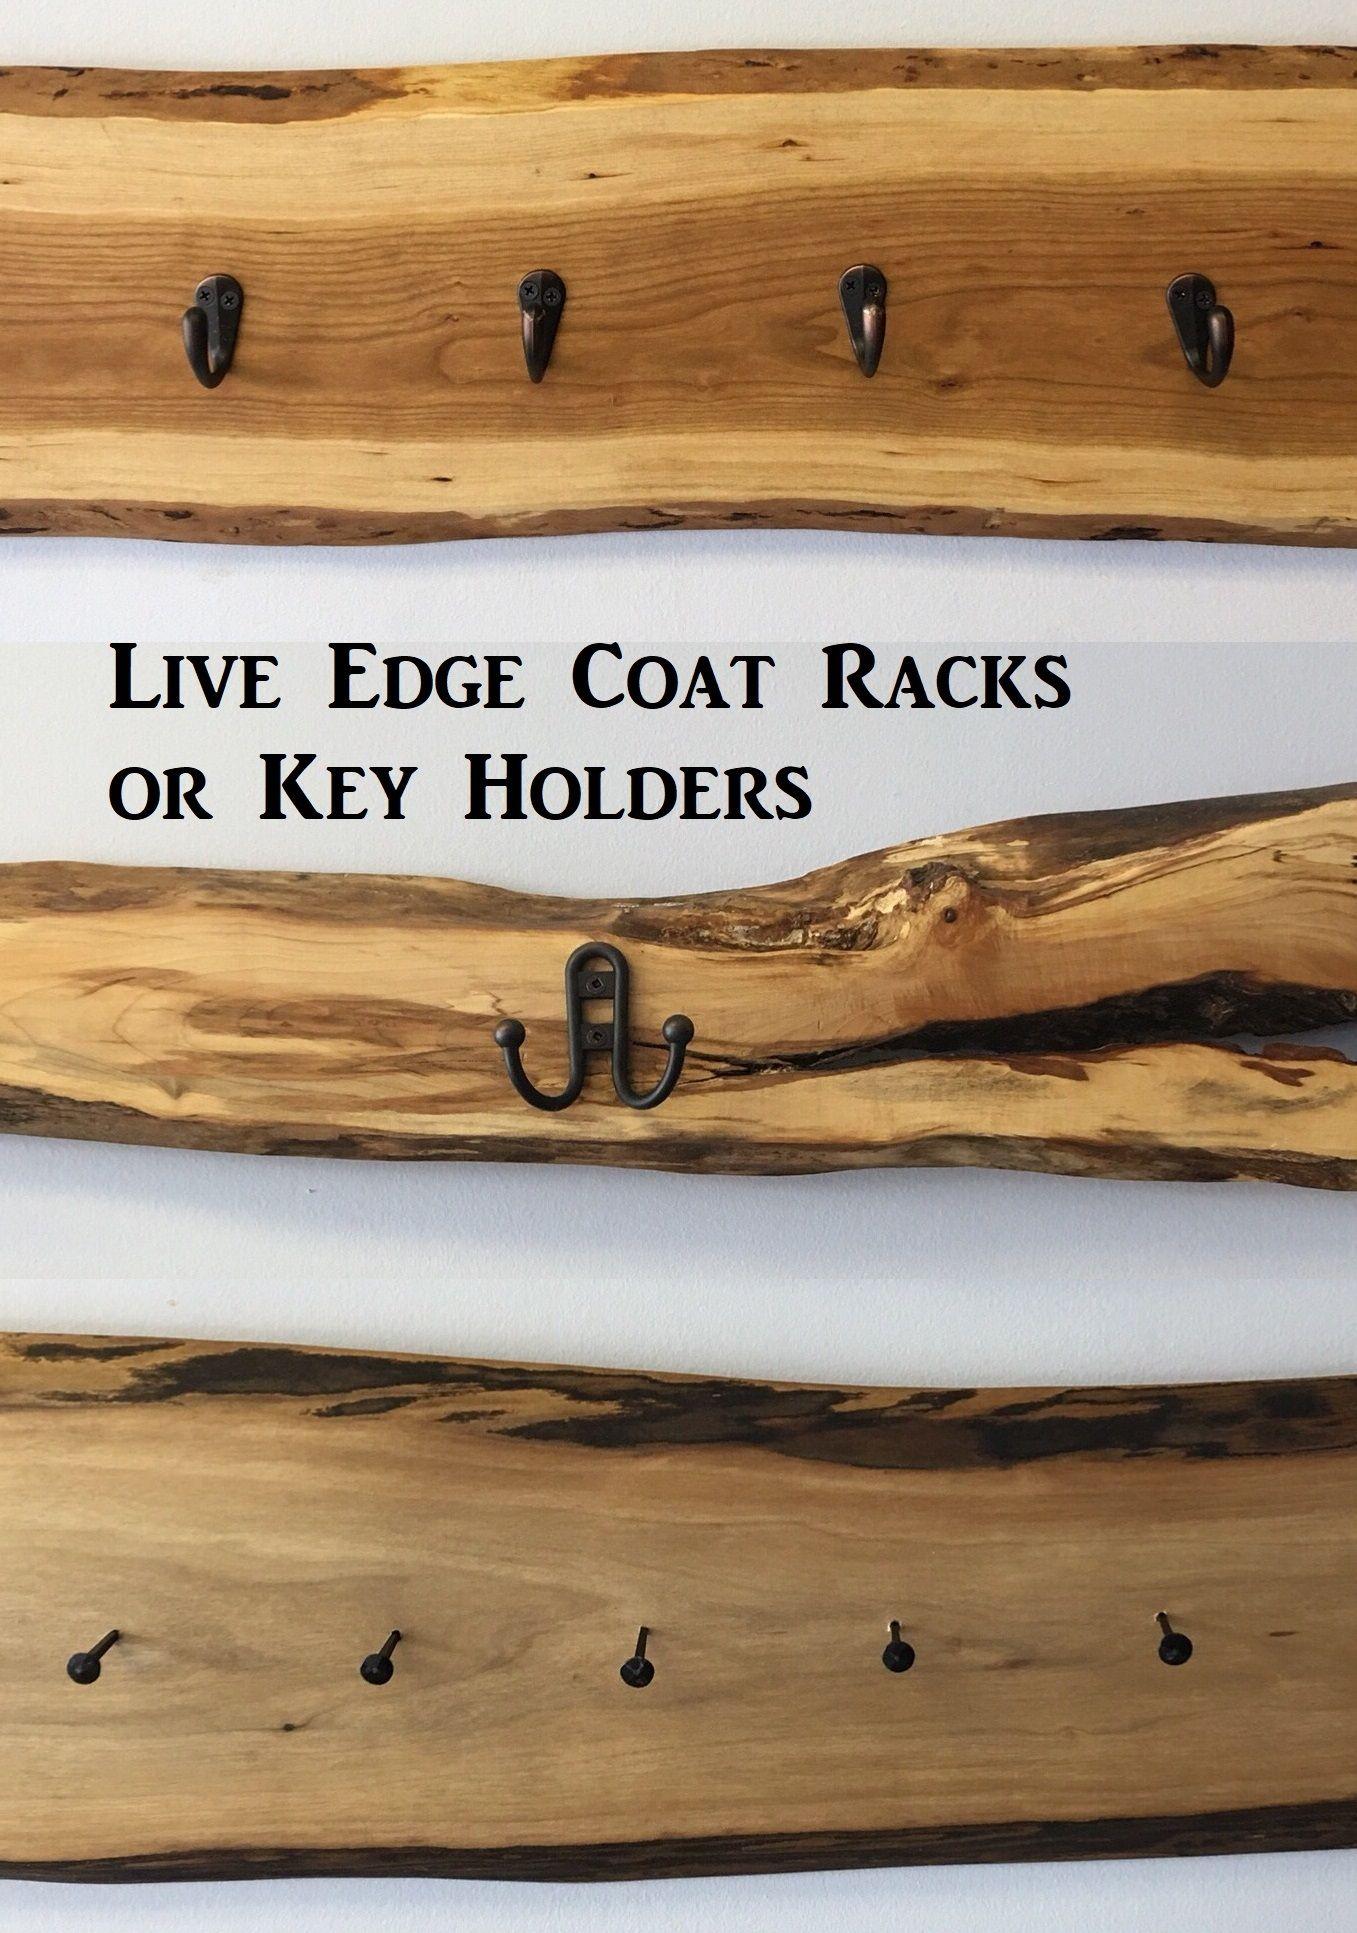 Wall Mounted Coat Rack Rustic Coat Hangers Rustic Key Holder Rustic Decor Live Edge Wall Coat Han Wall Mounted Key Holder Rustic Keys Wall Mounted Coat Rack